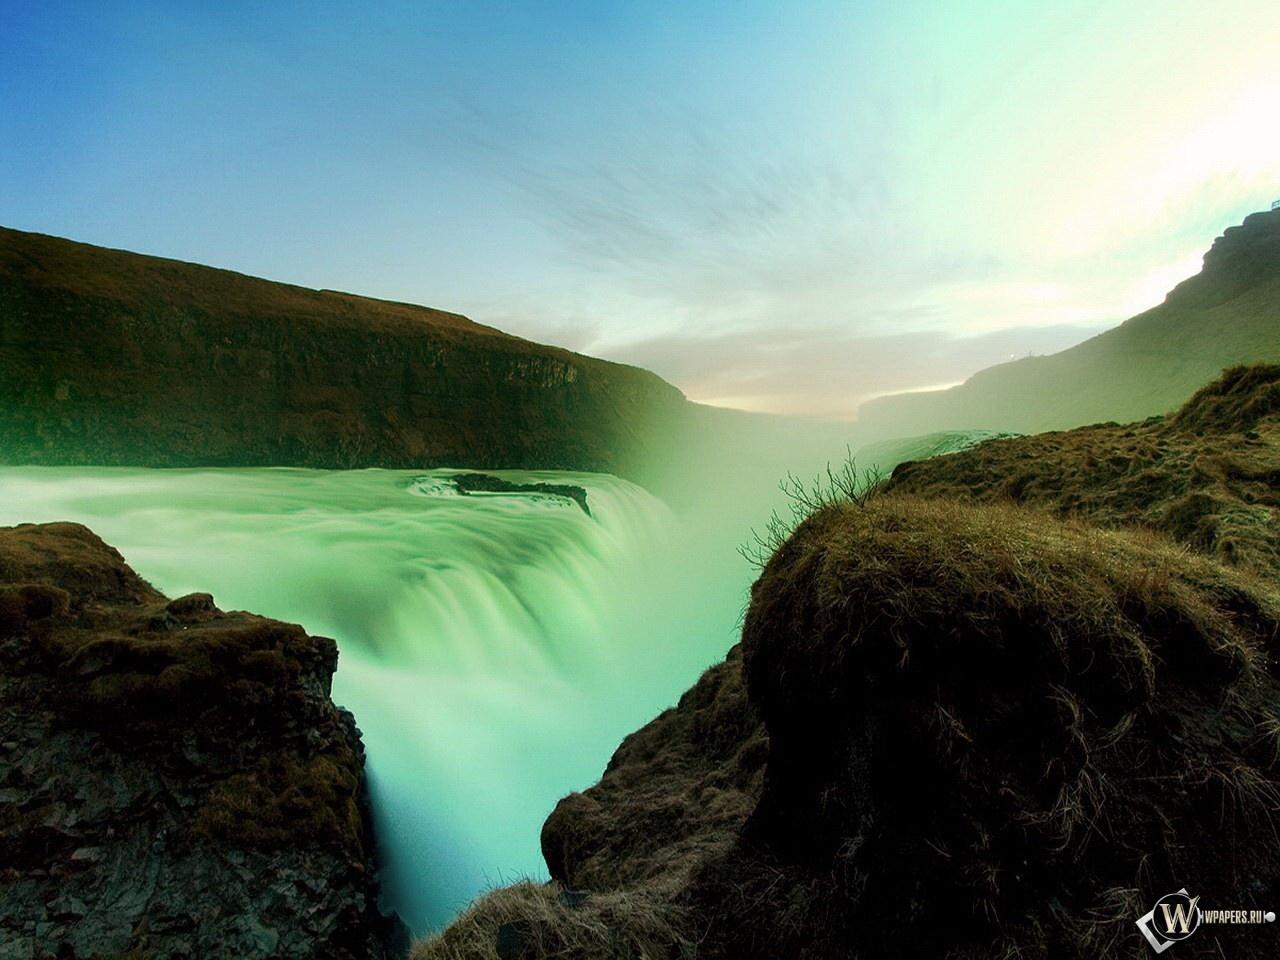 Обои на рабочий стол водопады 1024х768